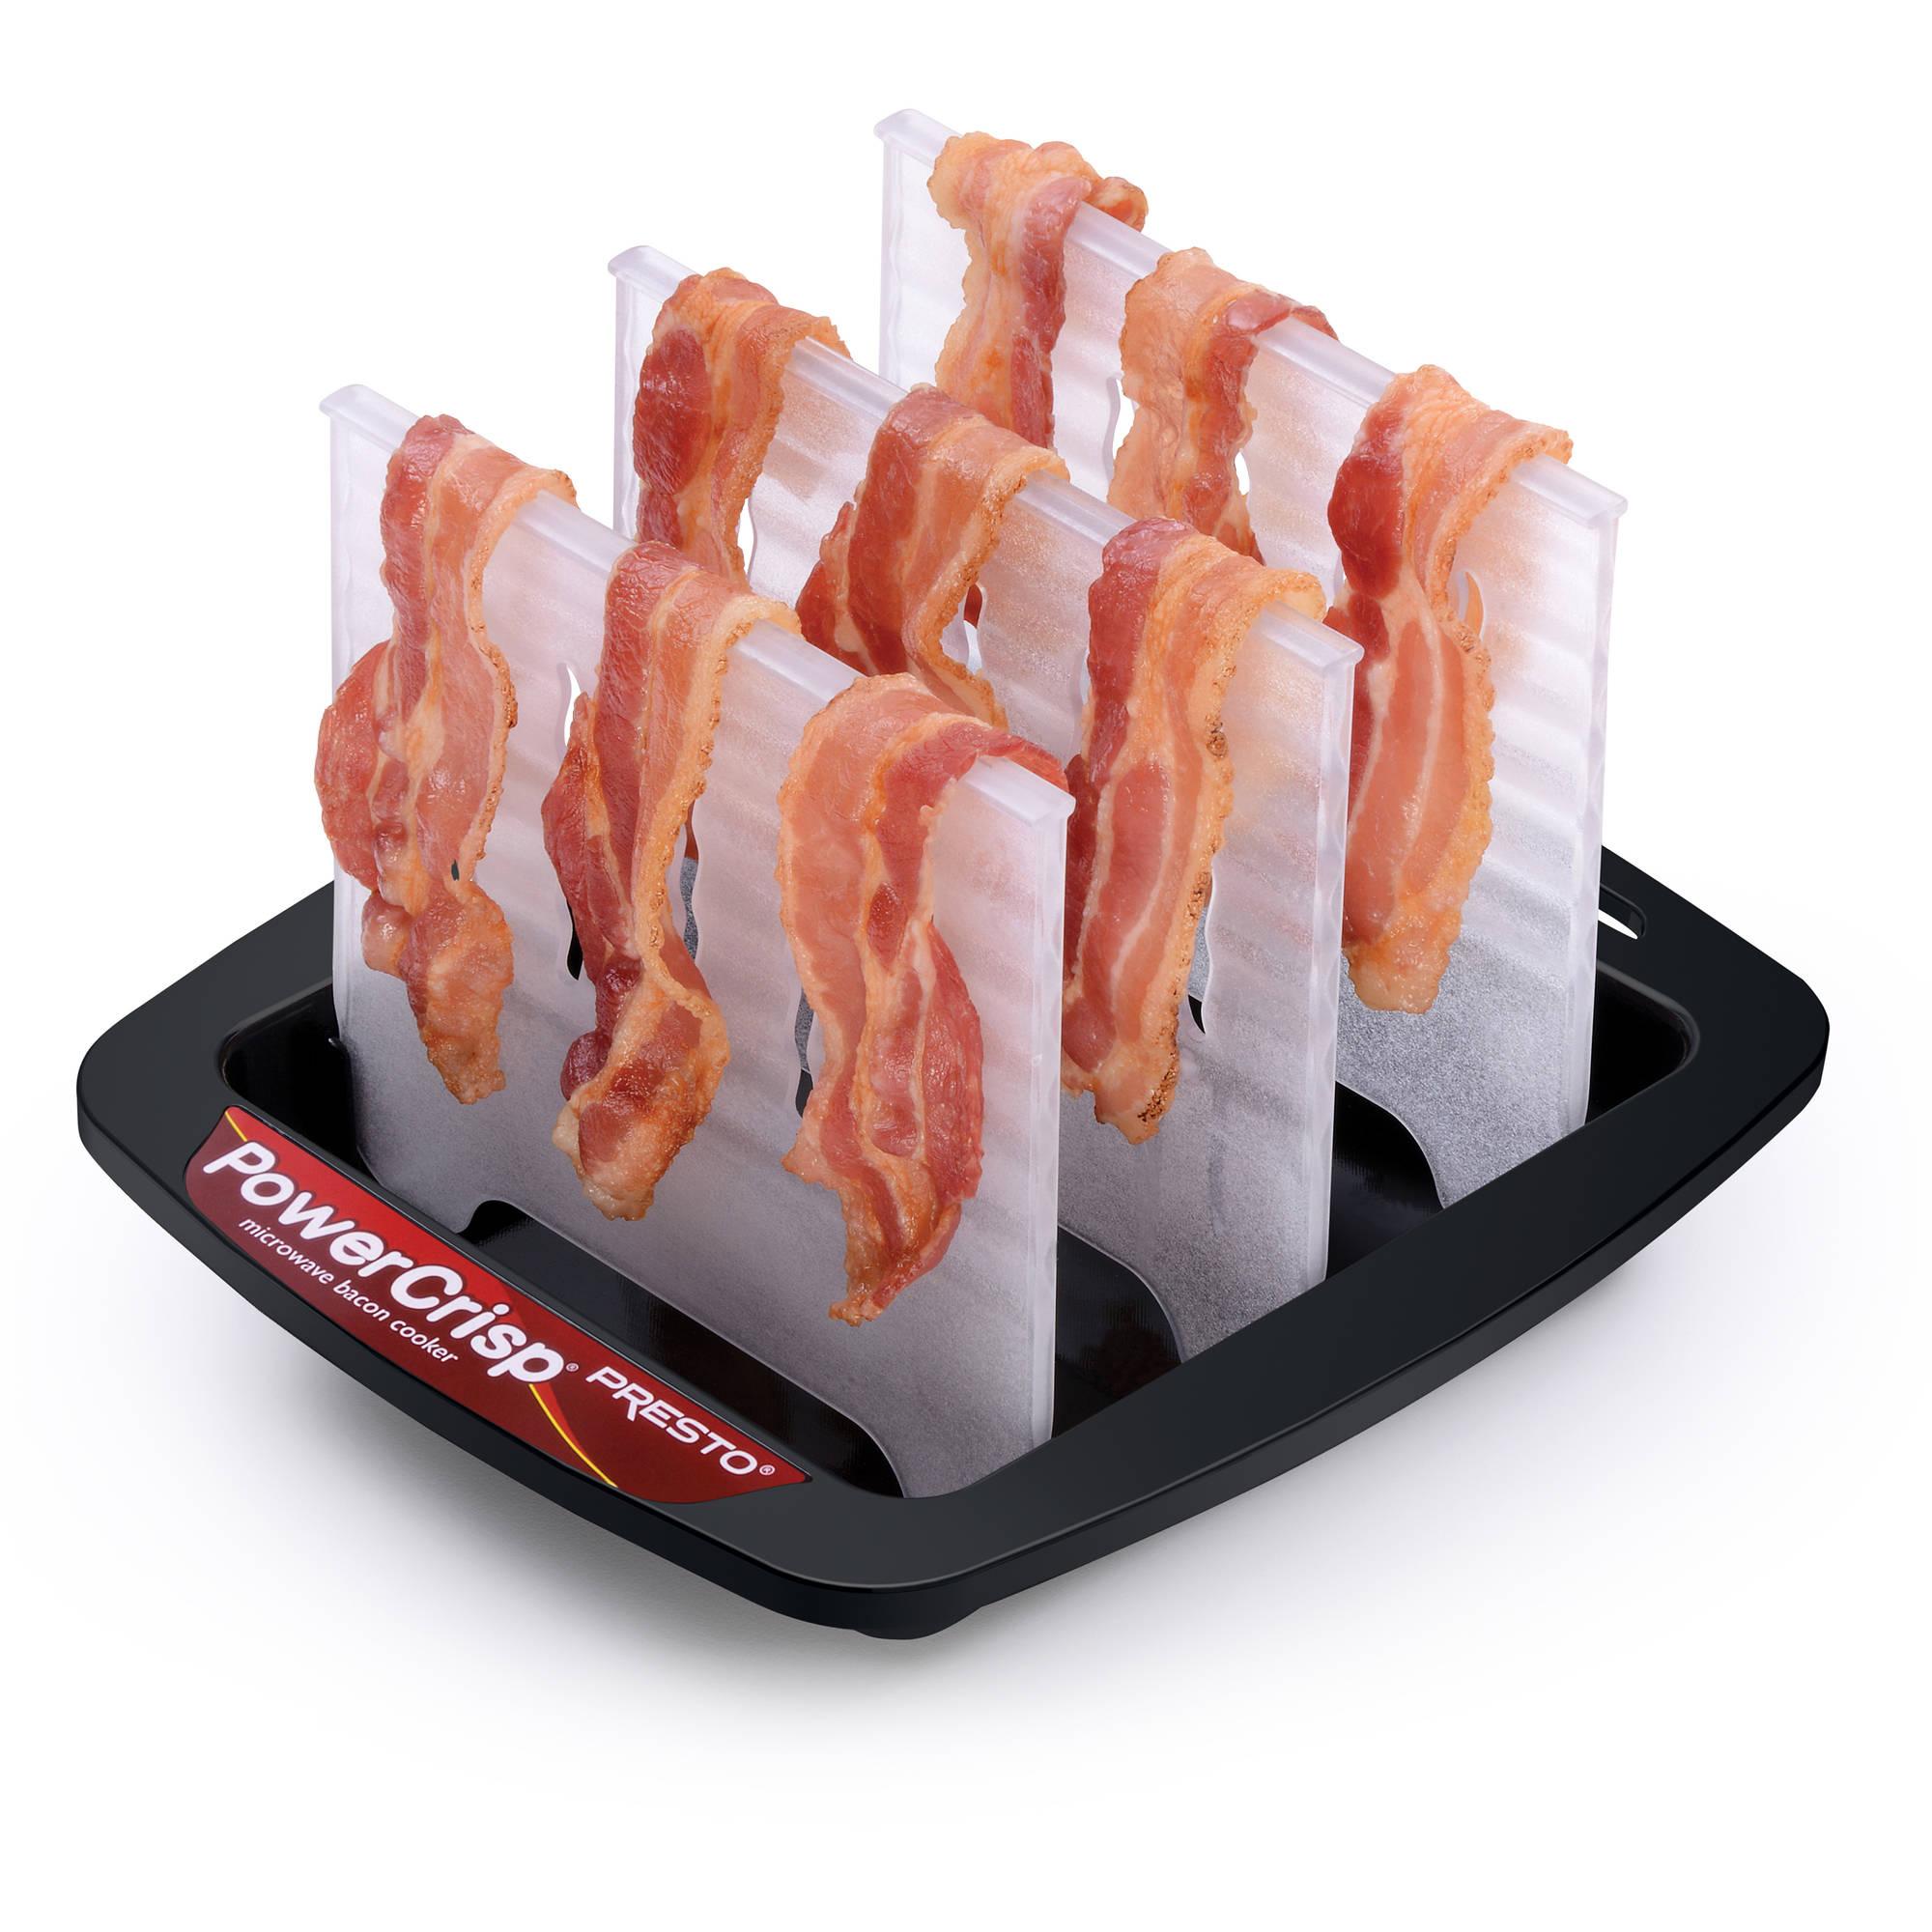 Presto Microwave Bacon Cooker